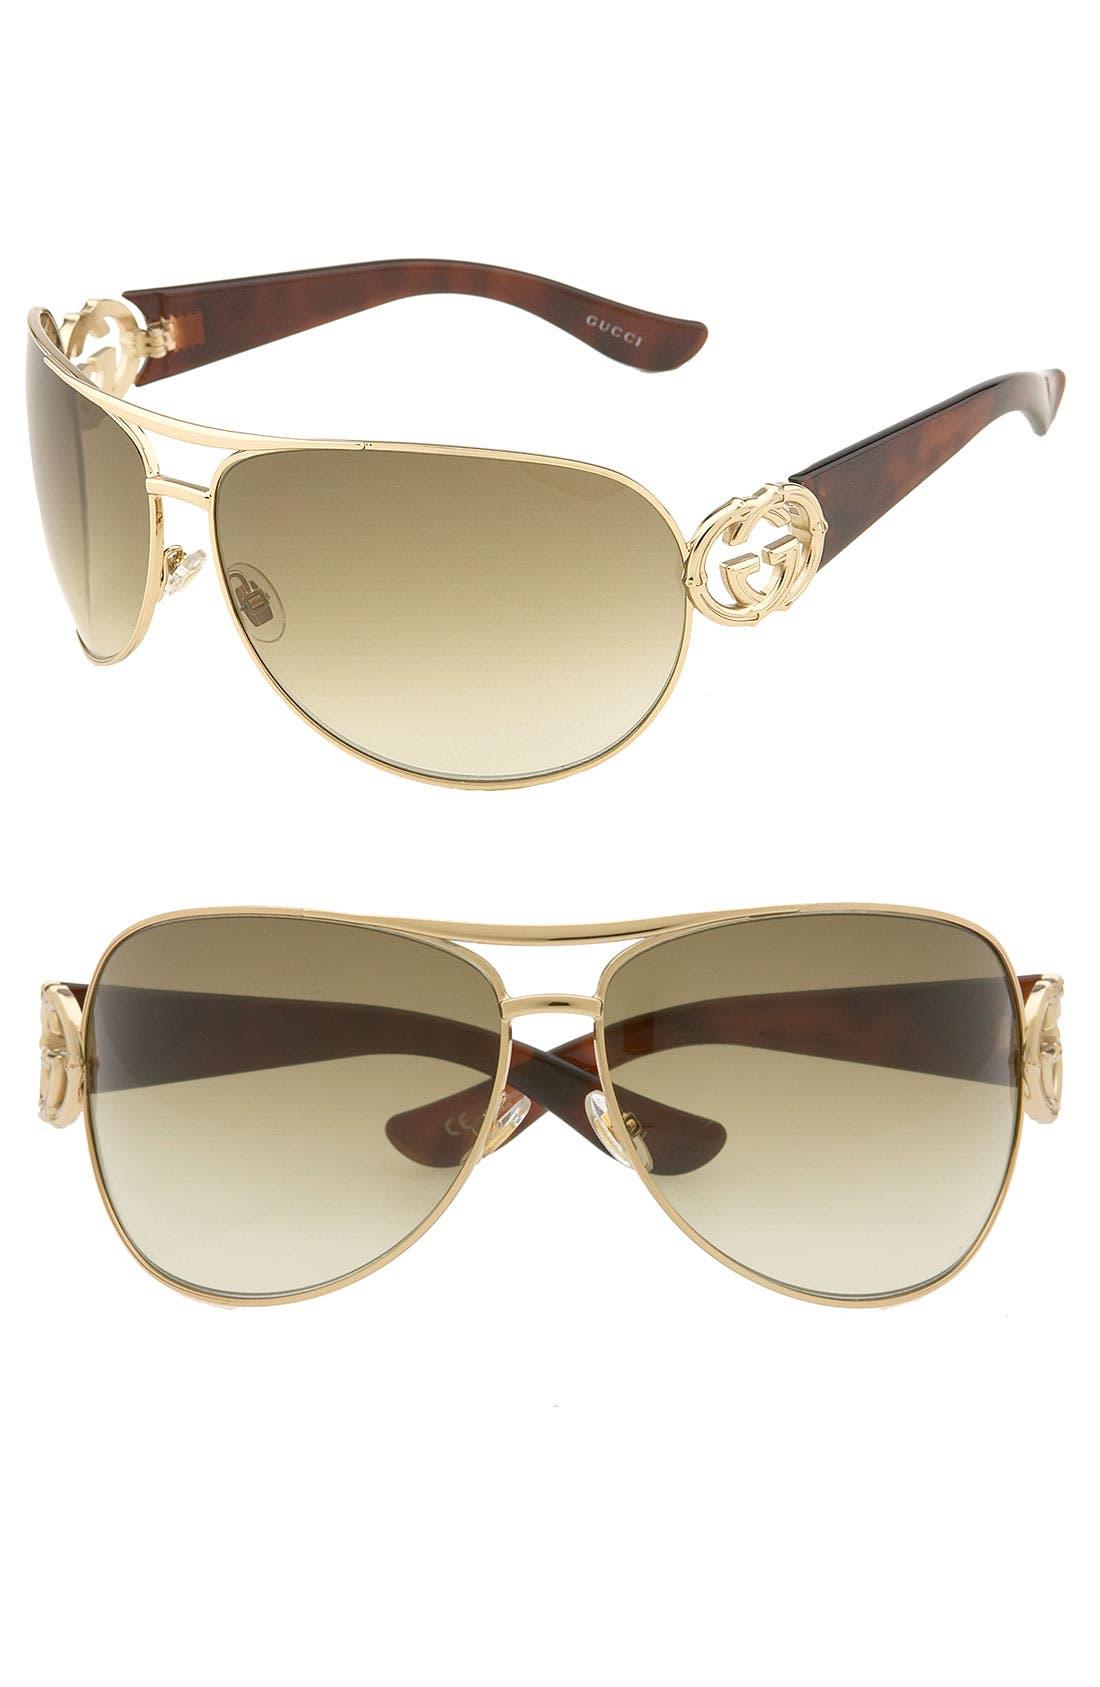 Main Image - Gucci Bamboo Logo Metal Aviator Sunglasses